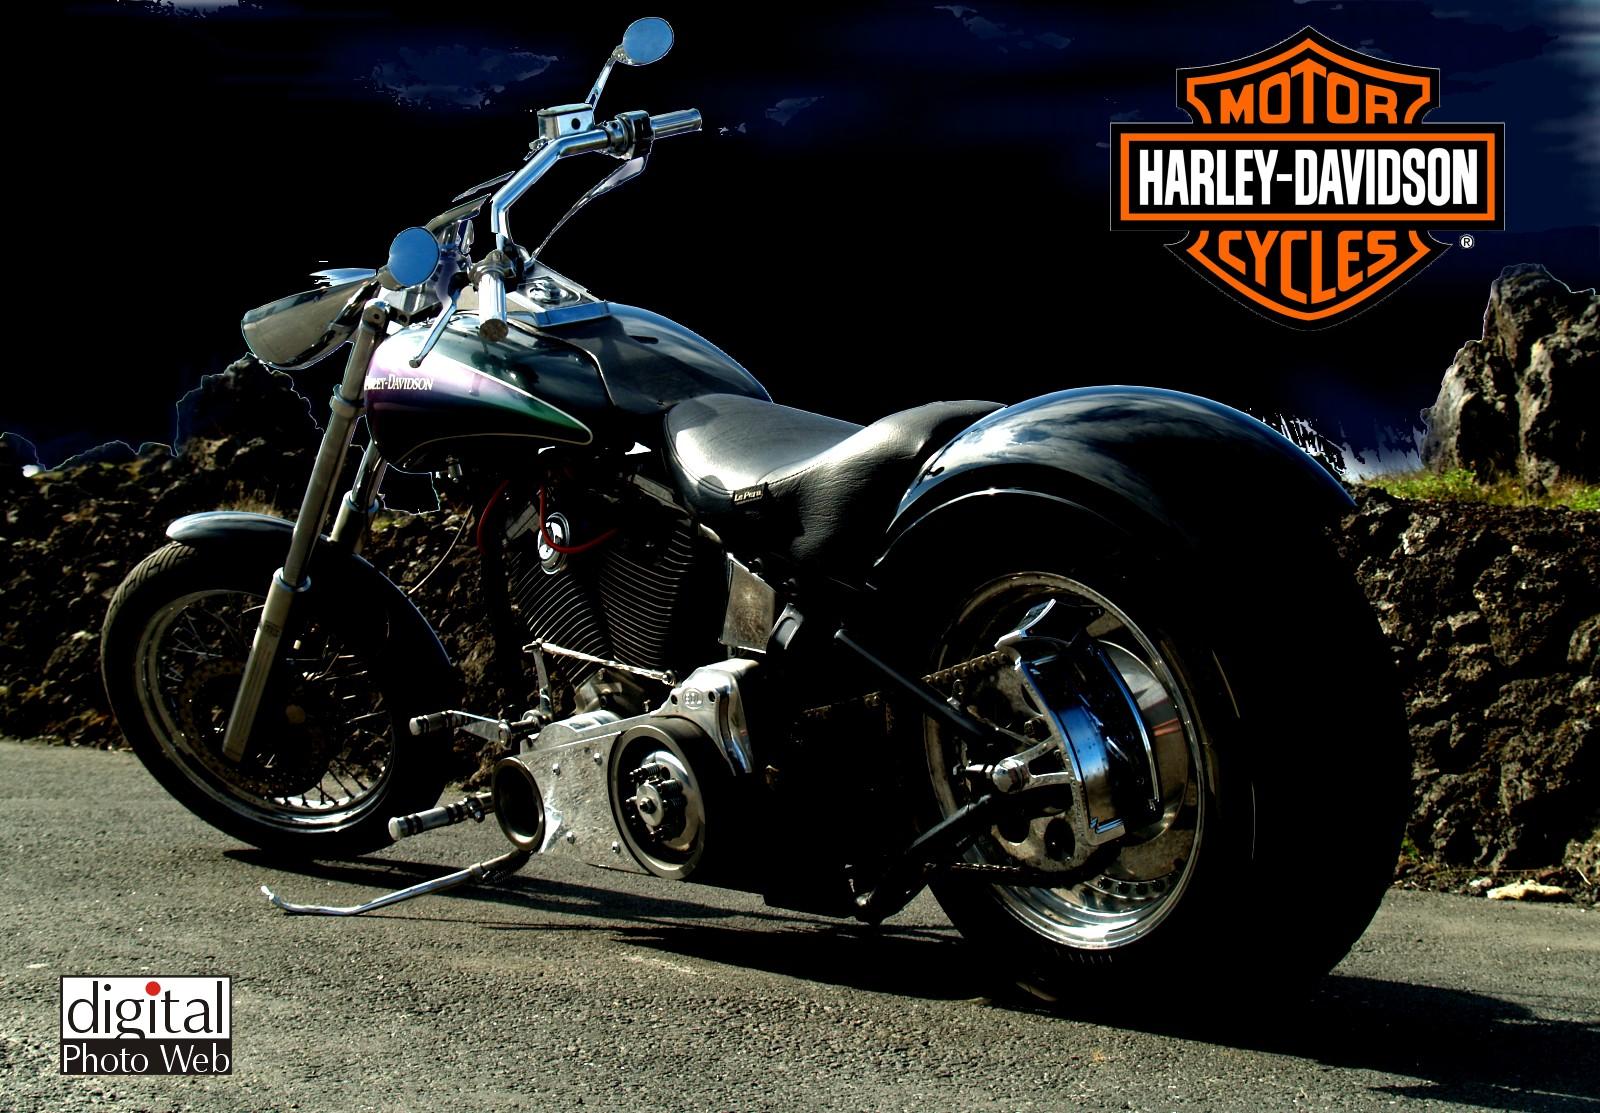 EL MUNDO AVATAR Willie G Davidson se retira de Harley Davidson 1600x1113